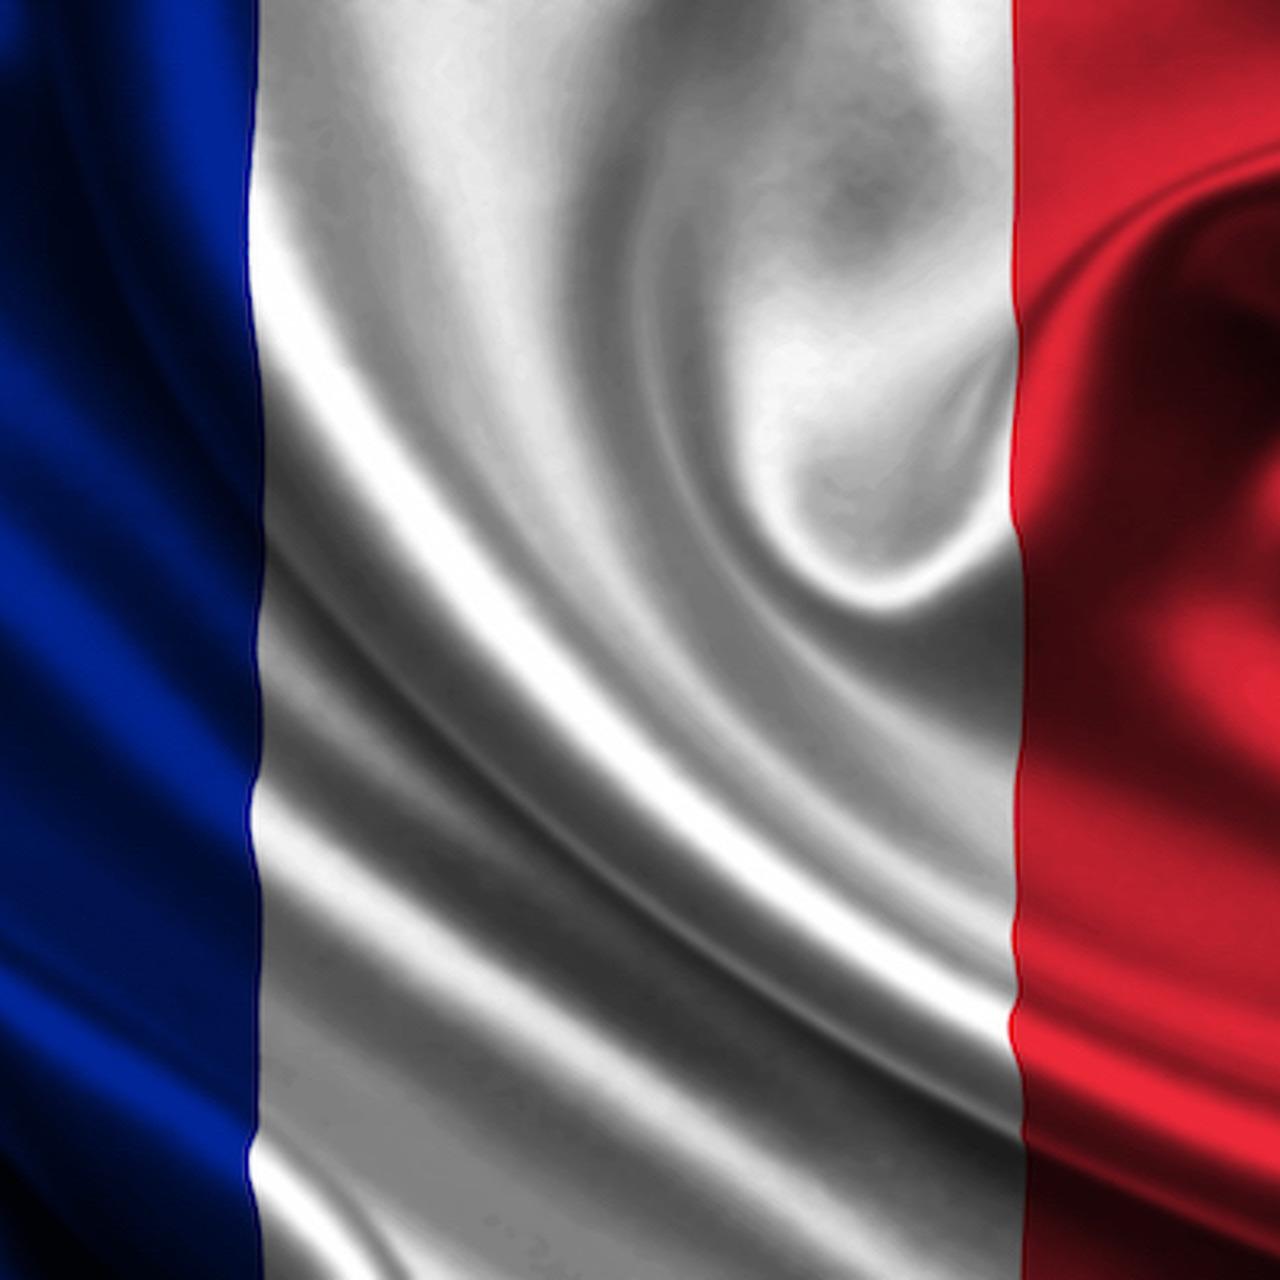 Motor1.com Announces European Expansion, Launches Motor1.com - France